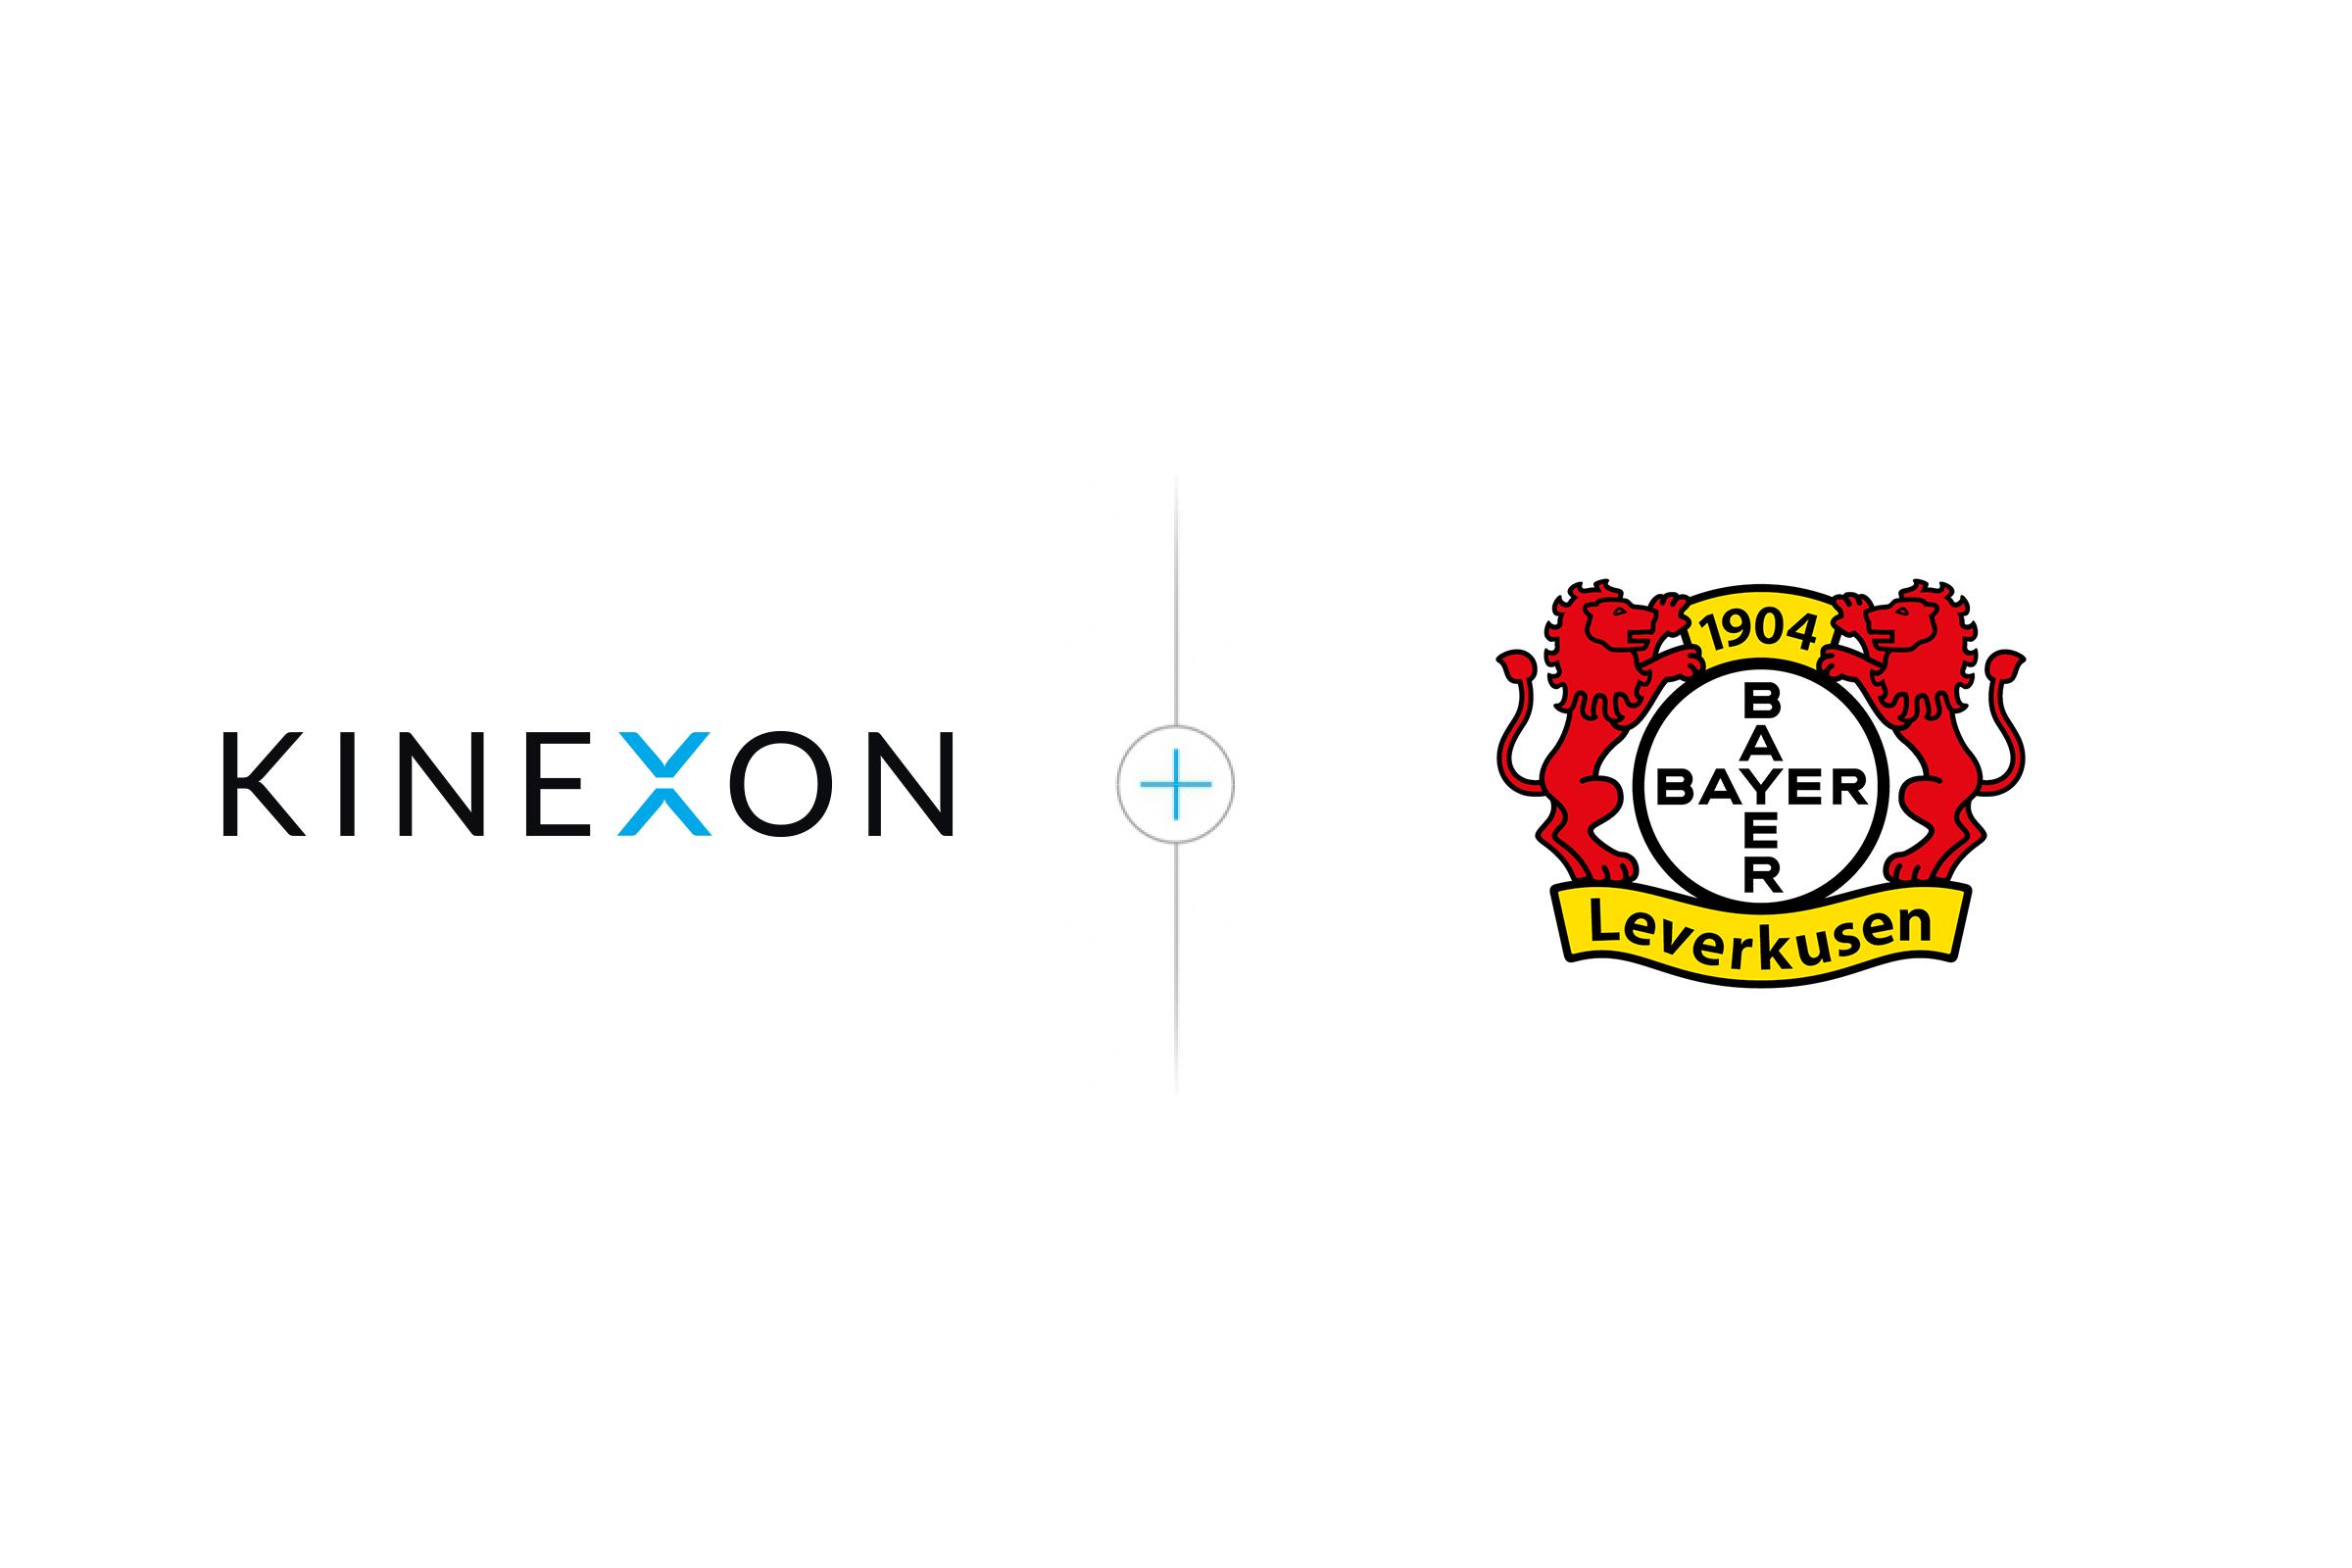 KINEXON X B04 Leverkusen